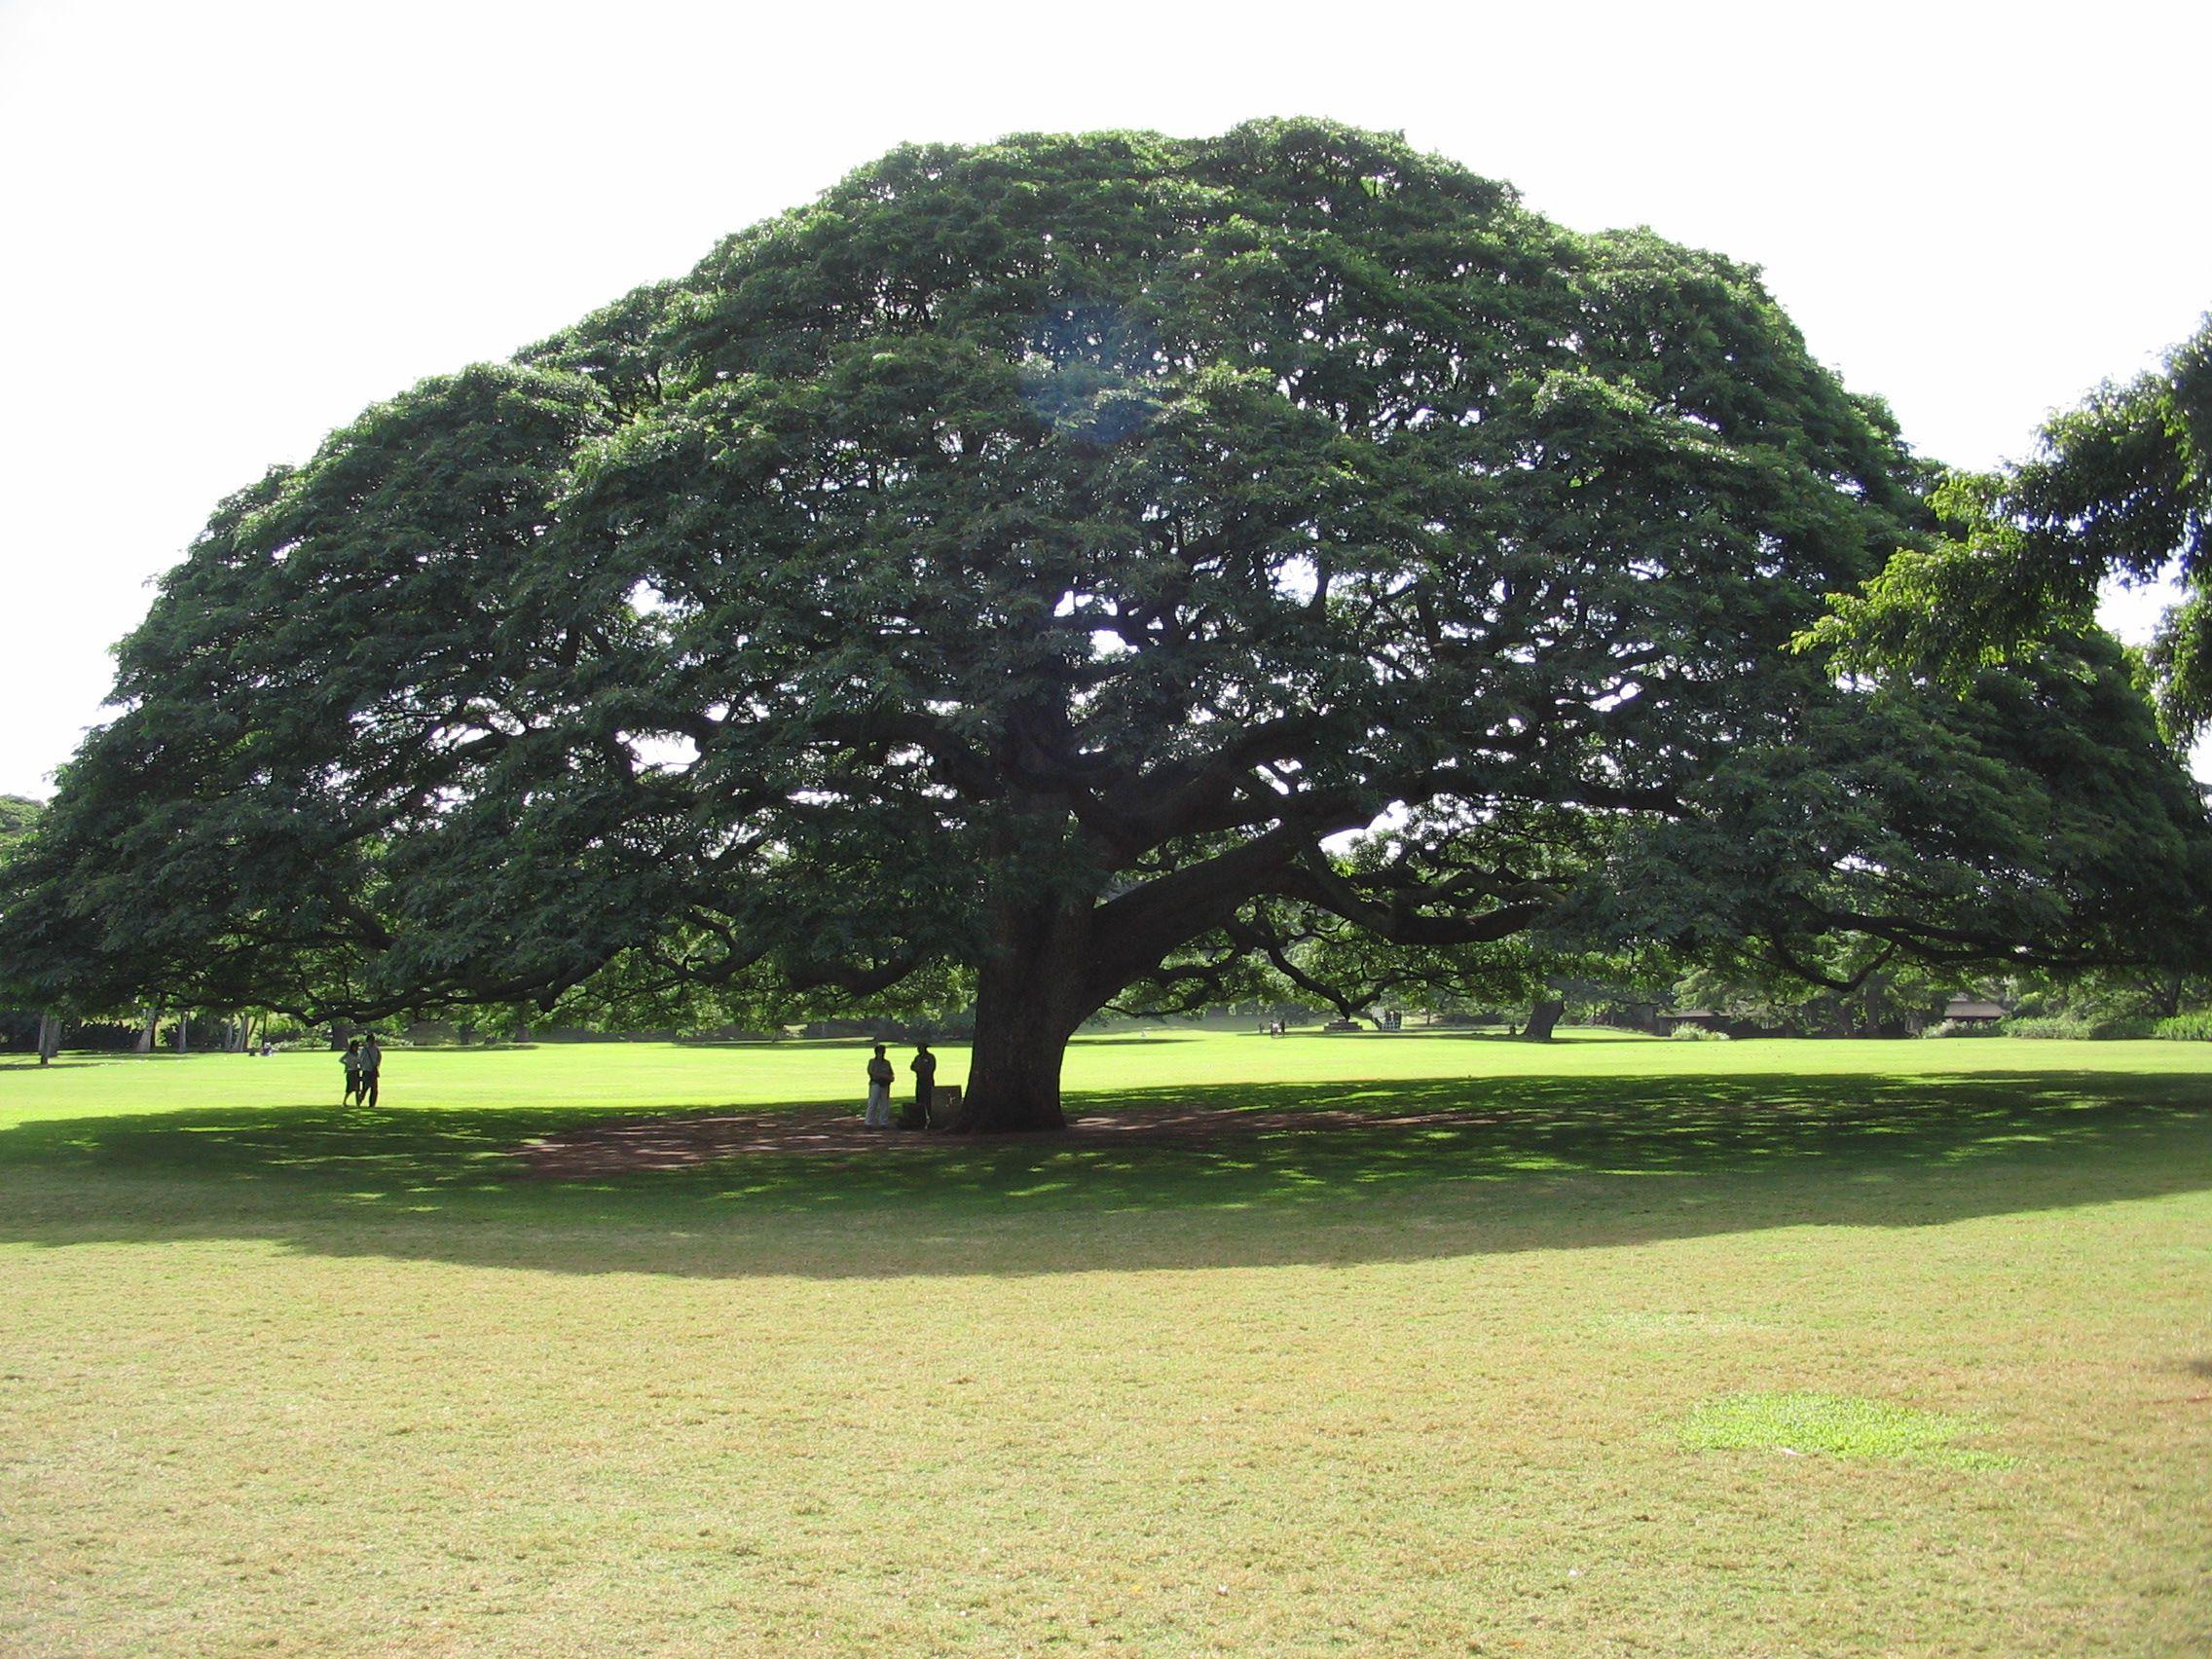 The Hitachi tree in Moanalua Gardens in Honolulu, Hawaii